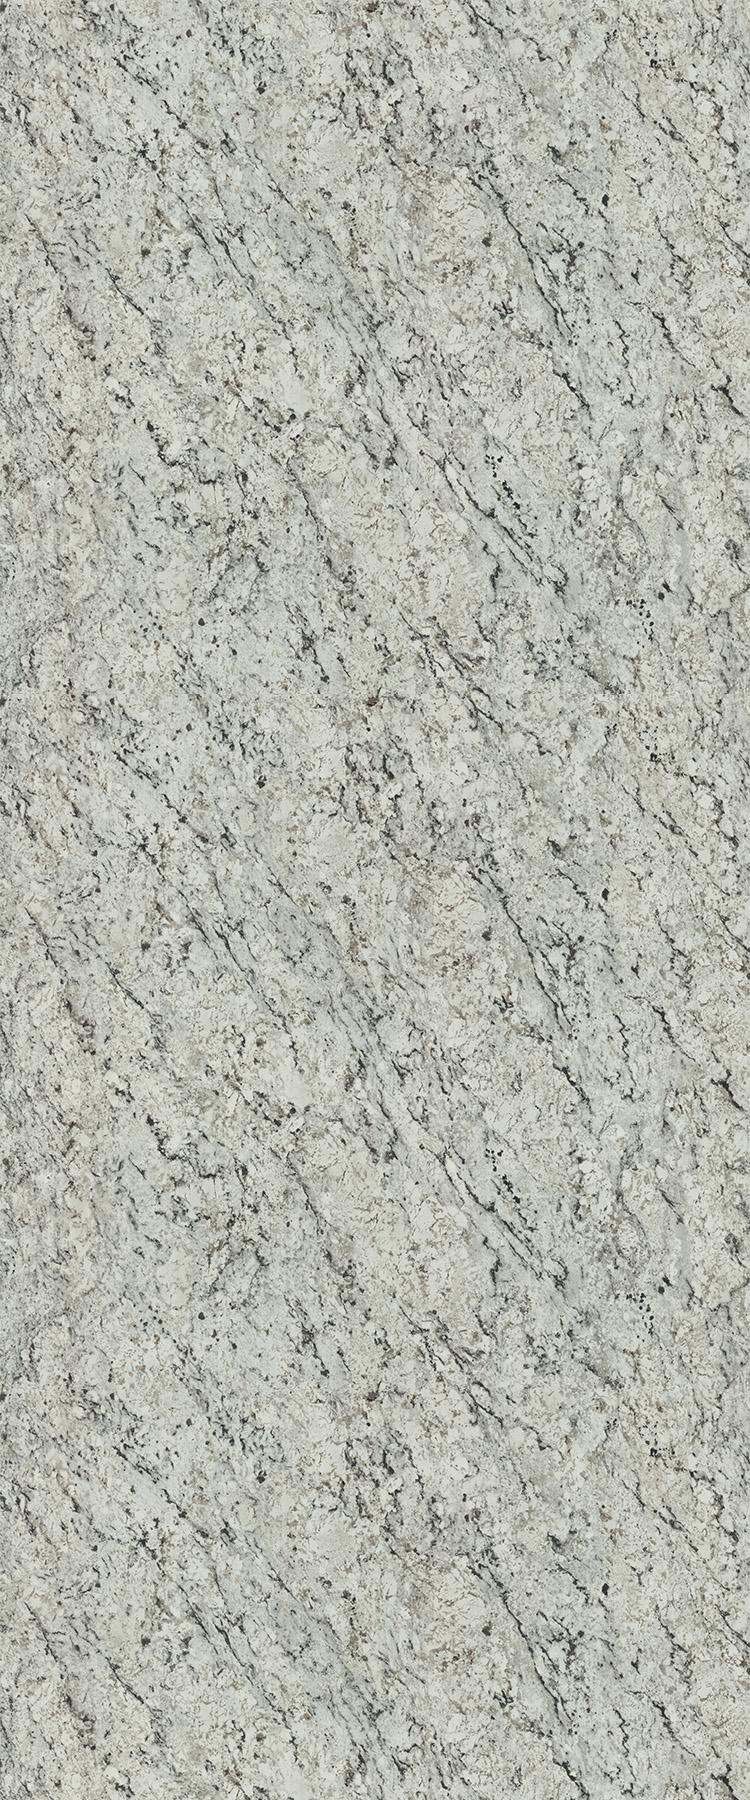 9476 White Ice Granite Formica Laminate Residential